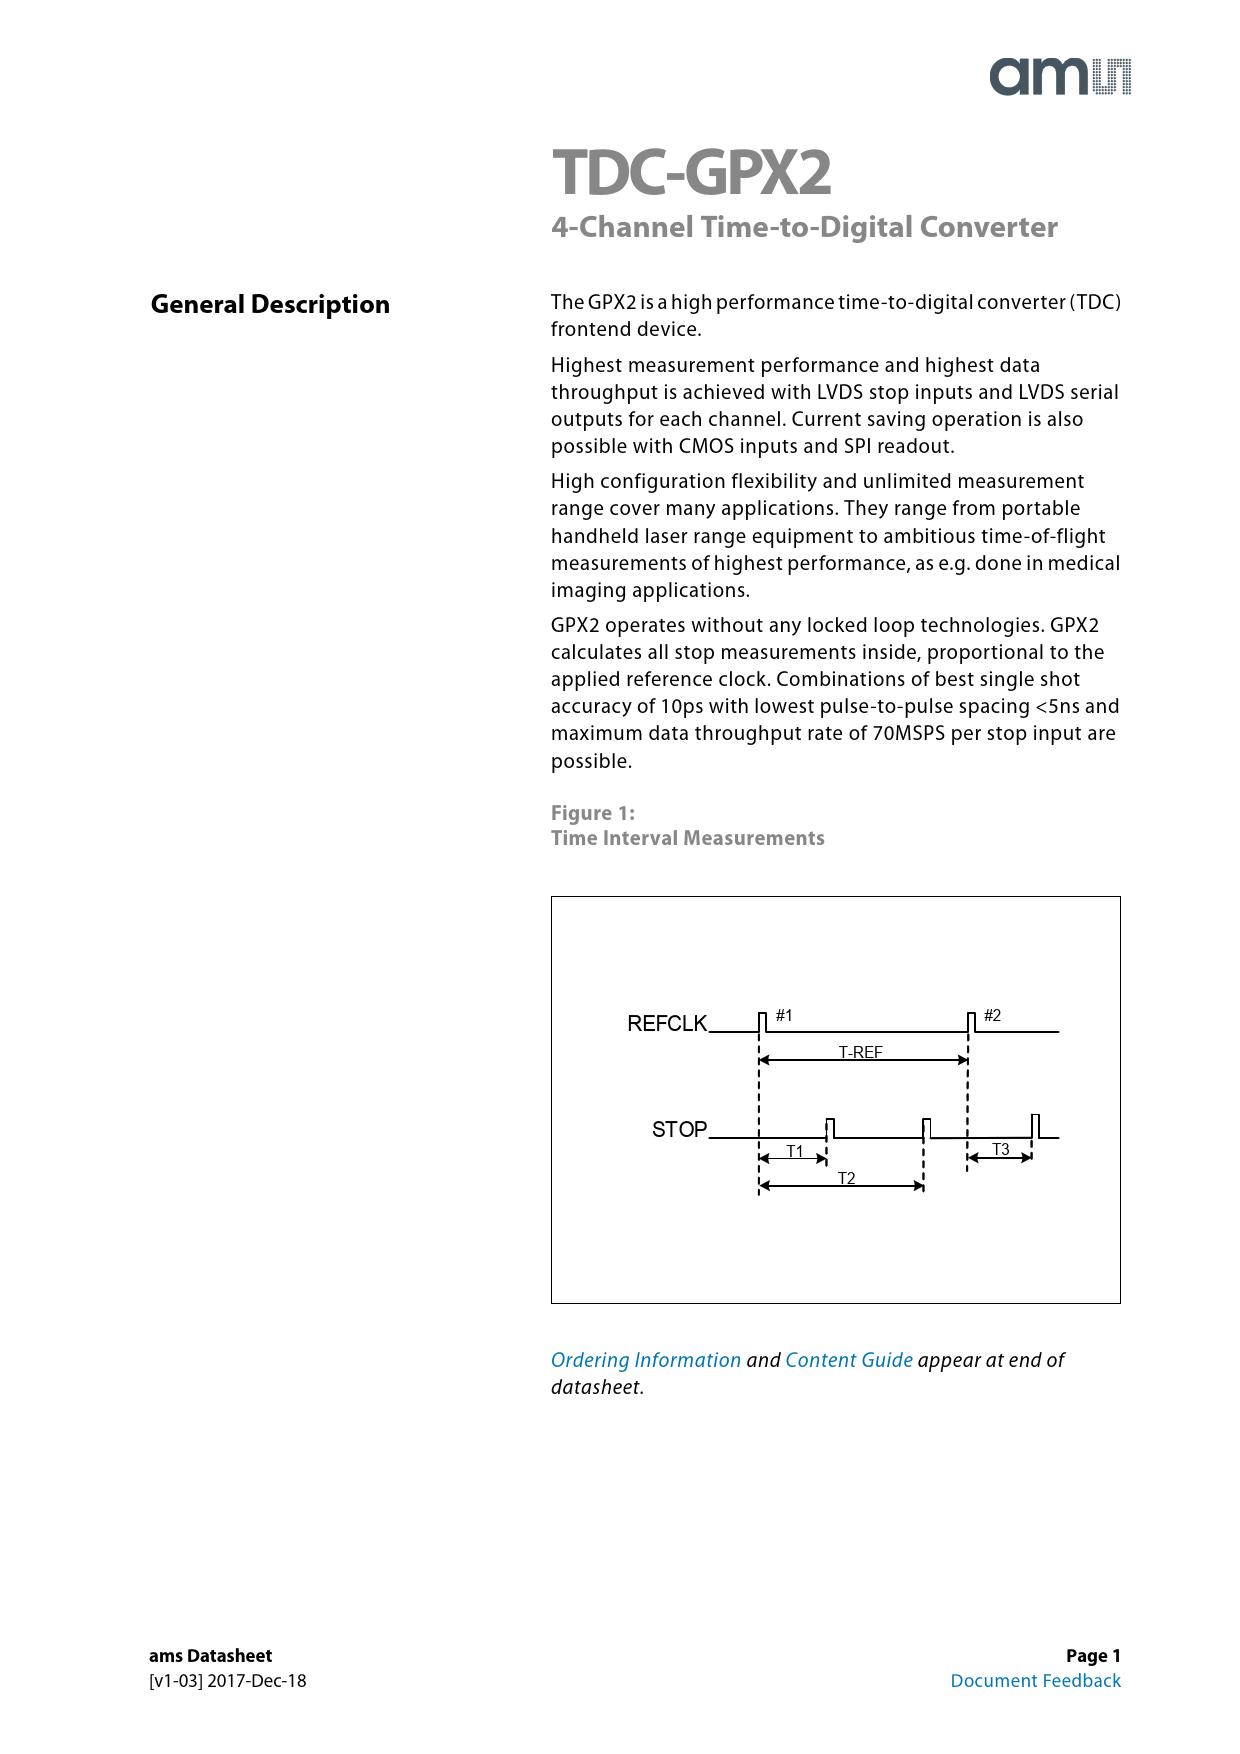 Datasheet TDC-GPX2 AustriaMicroSystems, Версия: 1-03